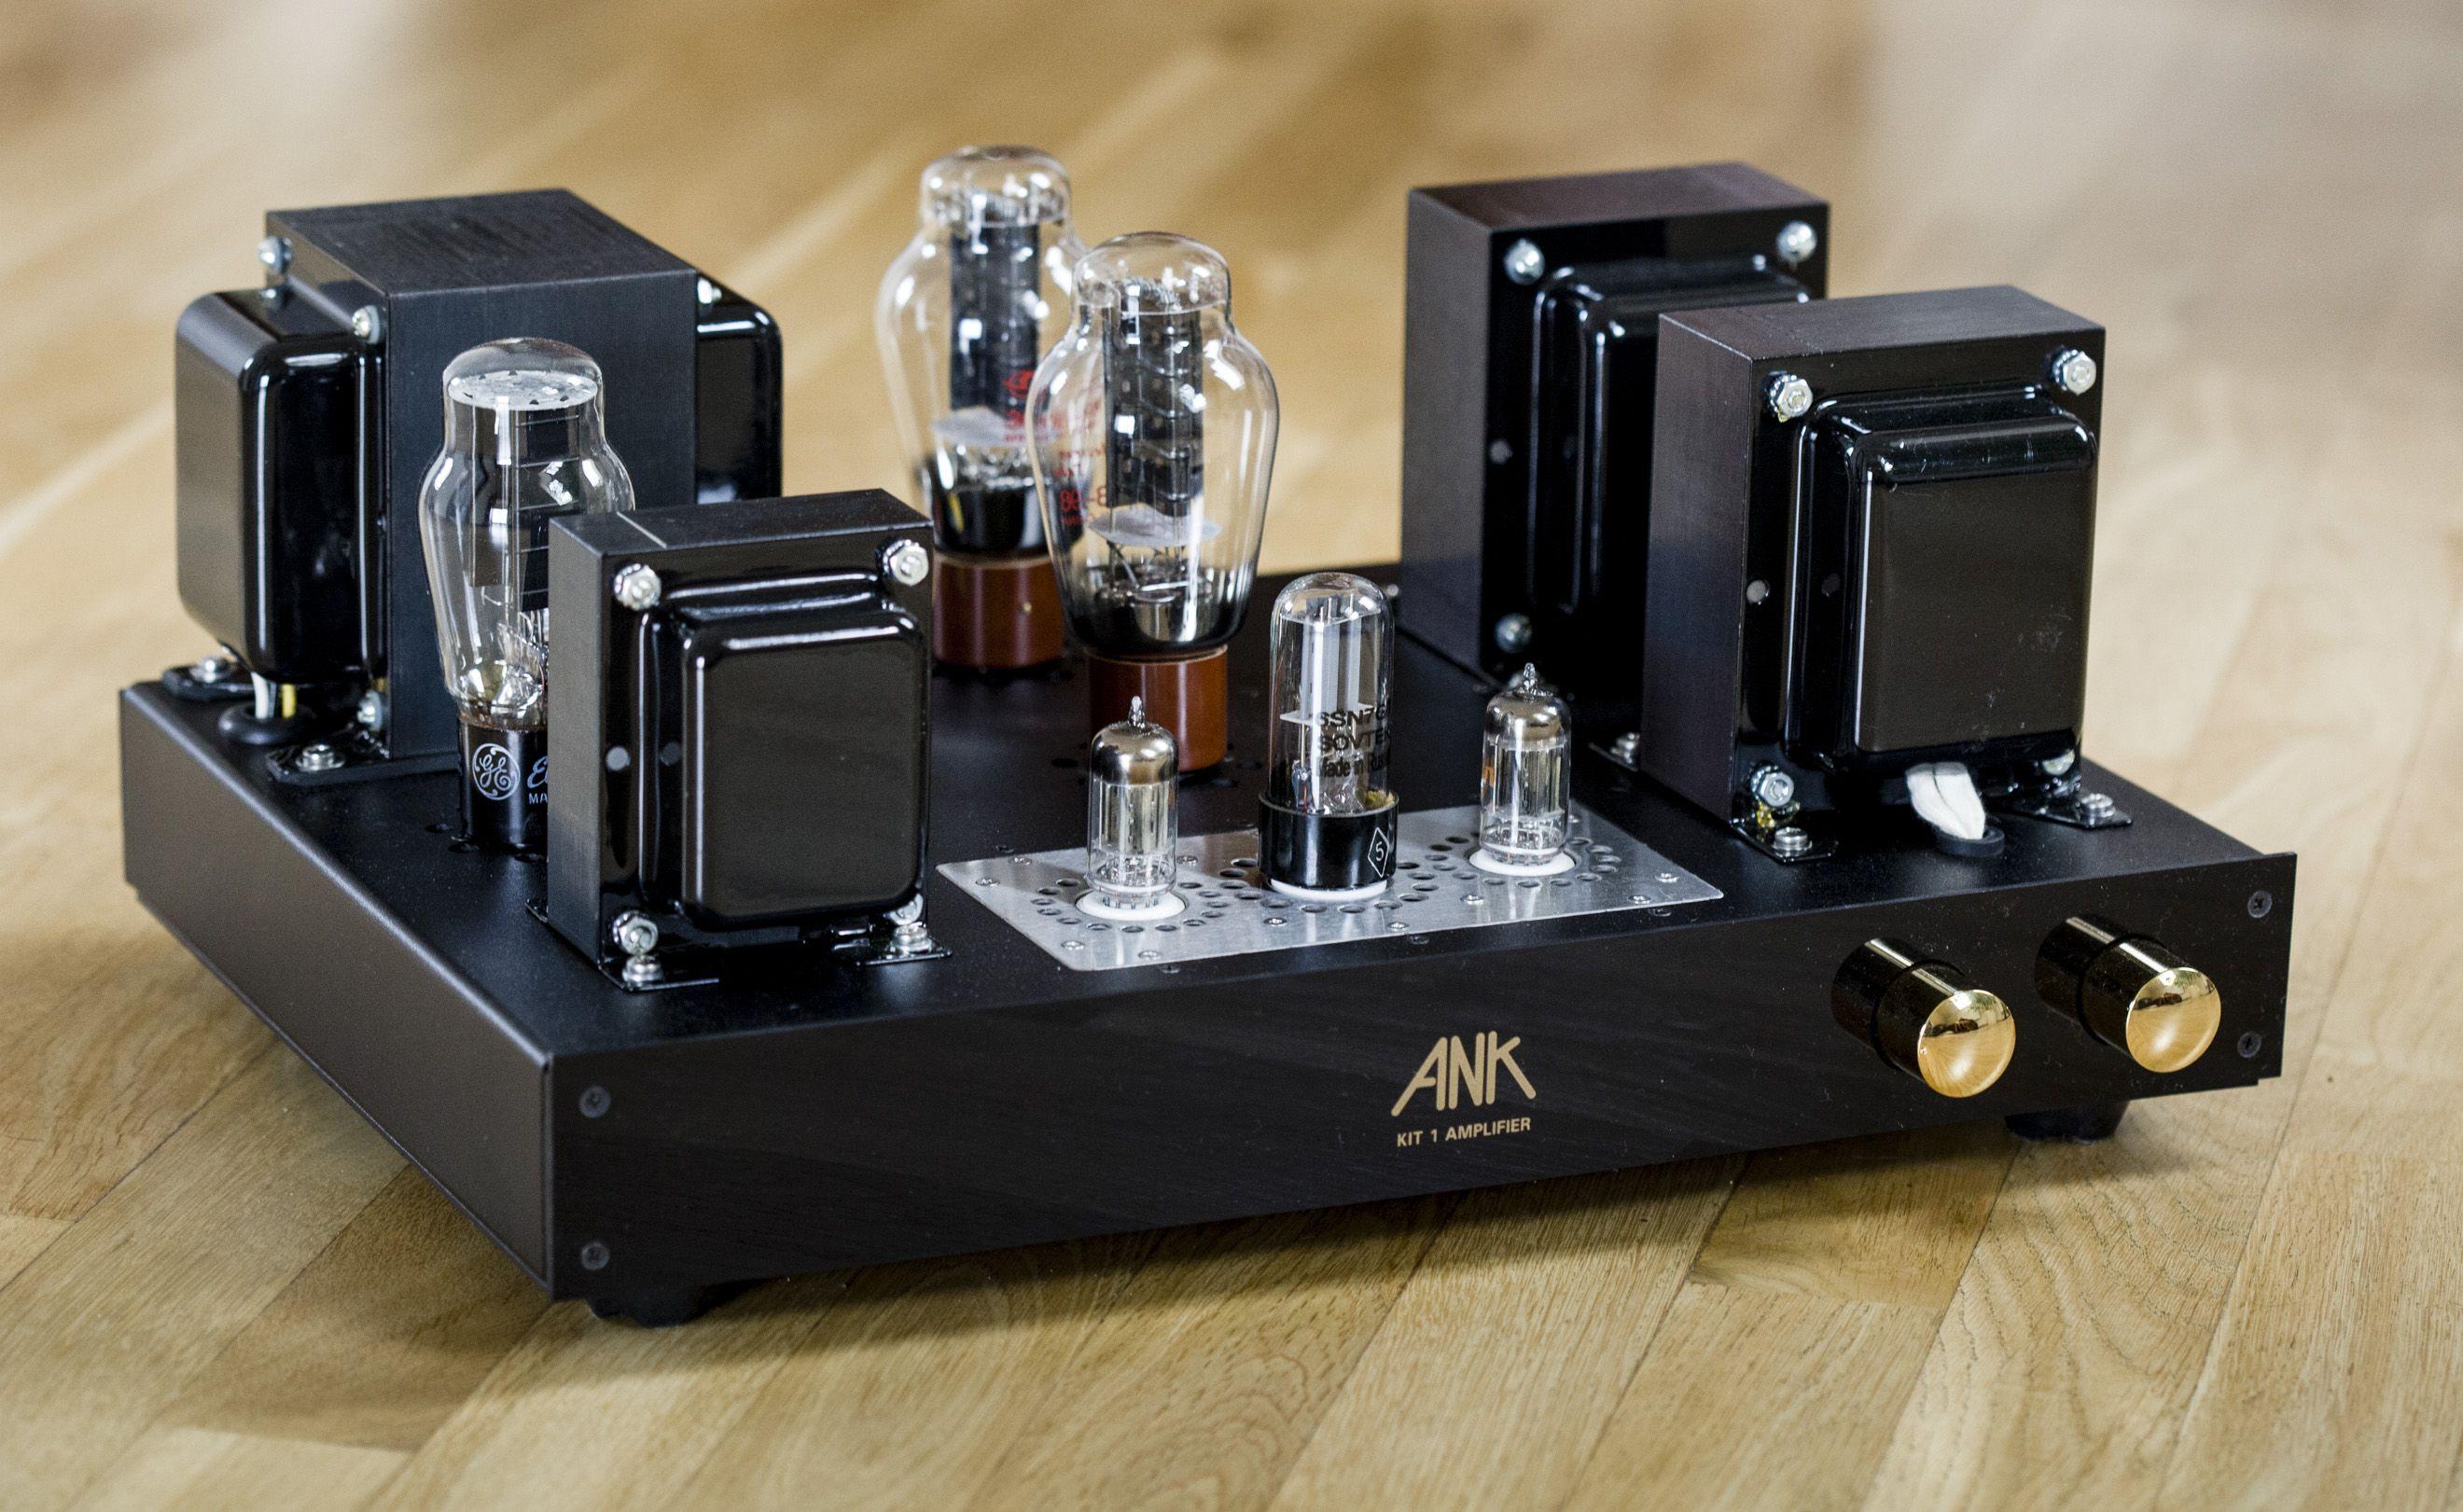 Audio Note KIT1 | TUBE AMPS! | Valve amplifier, Vacuum tube, Audio